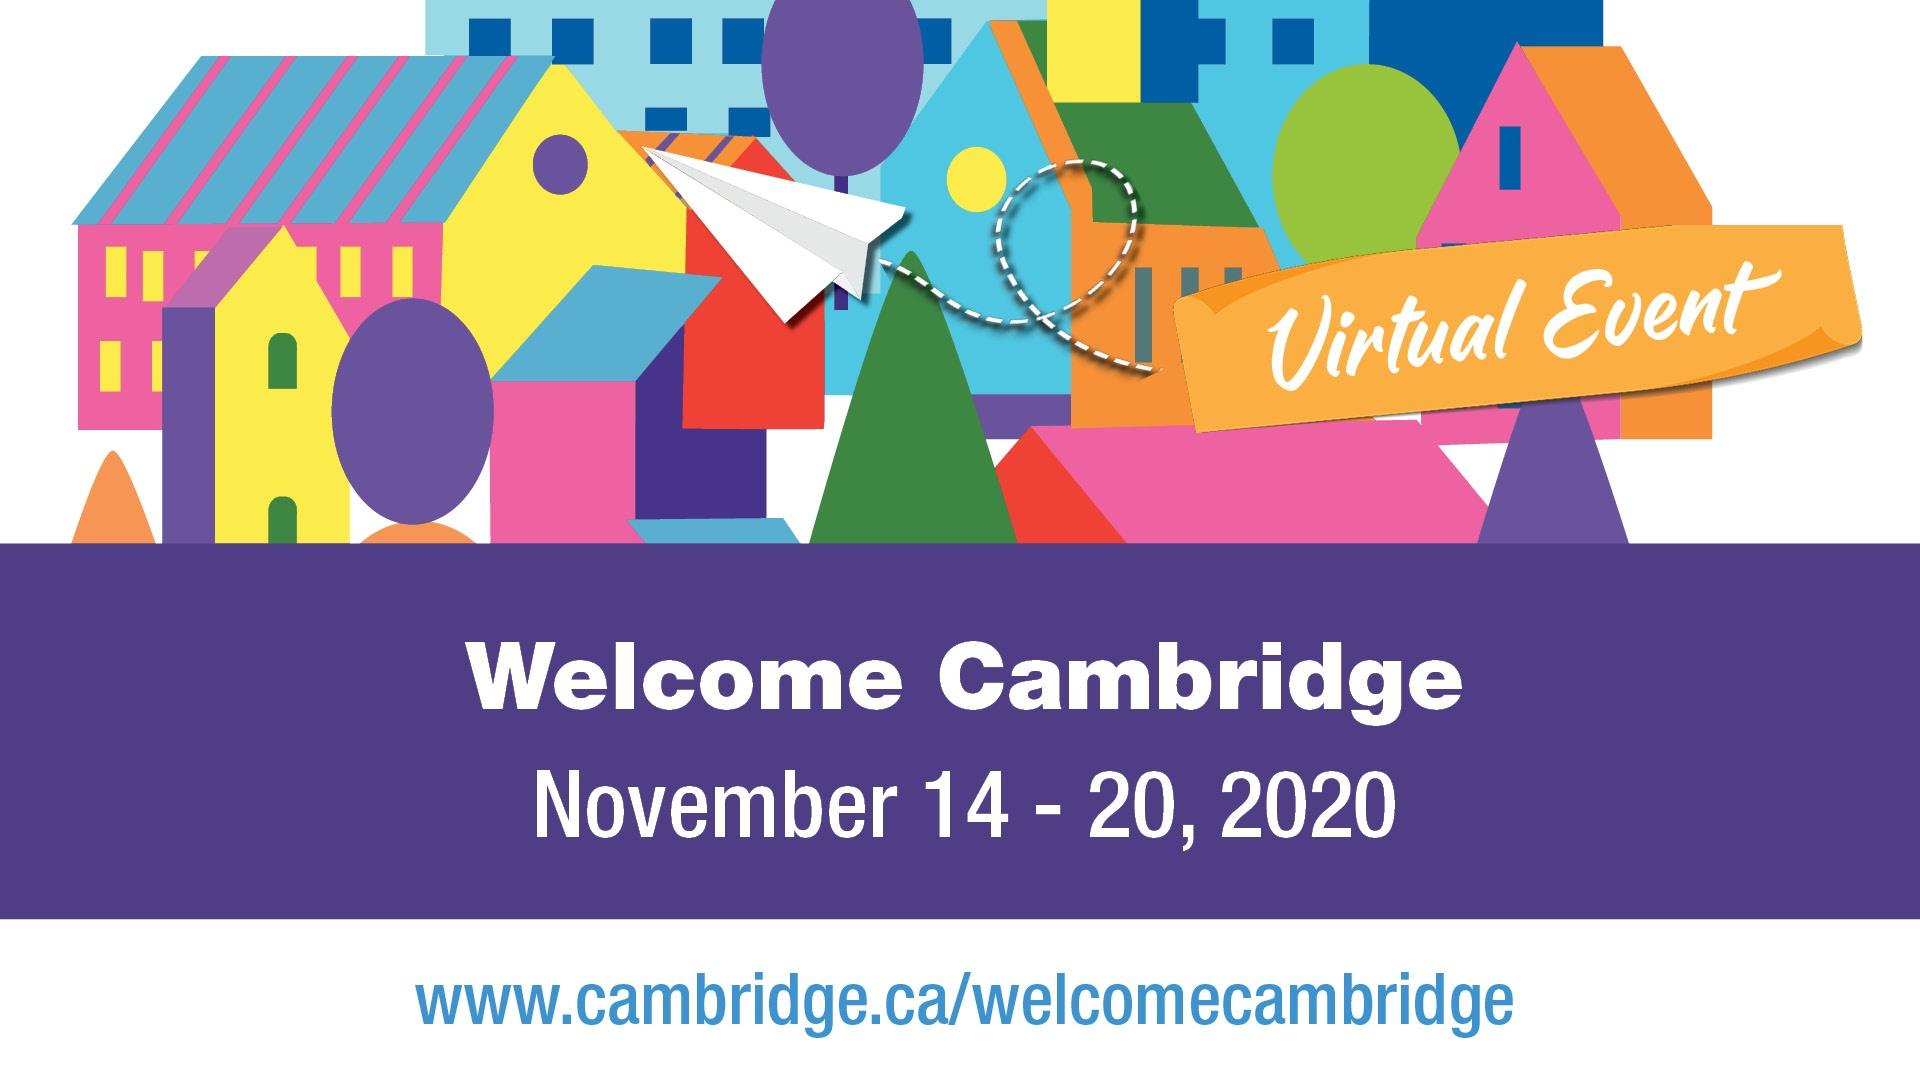 Welcome Cambridge